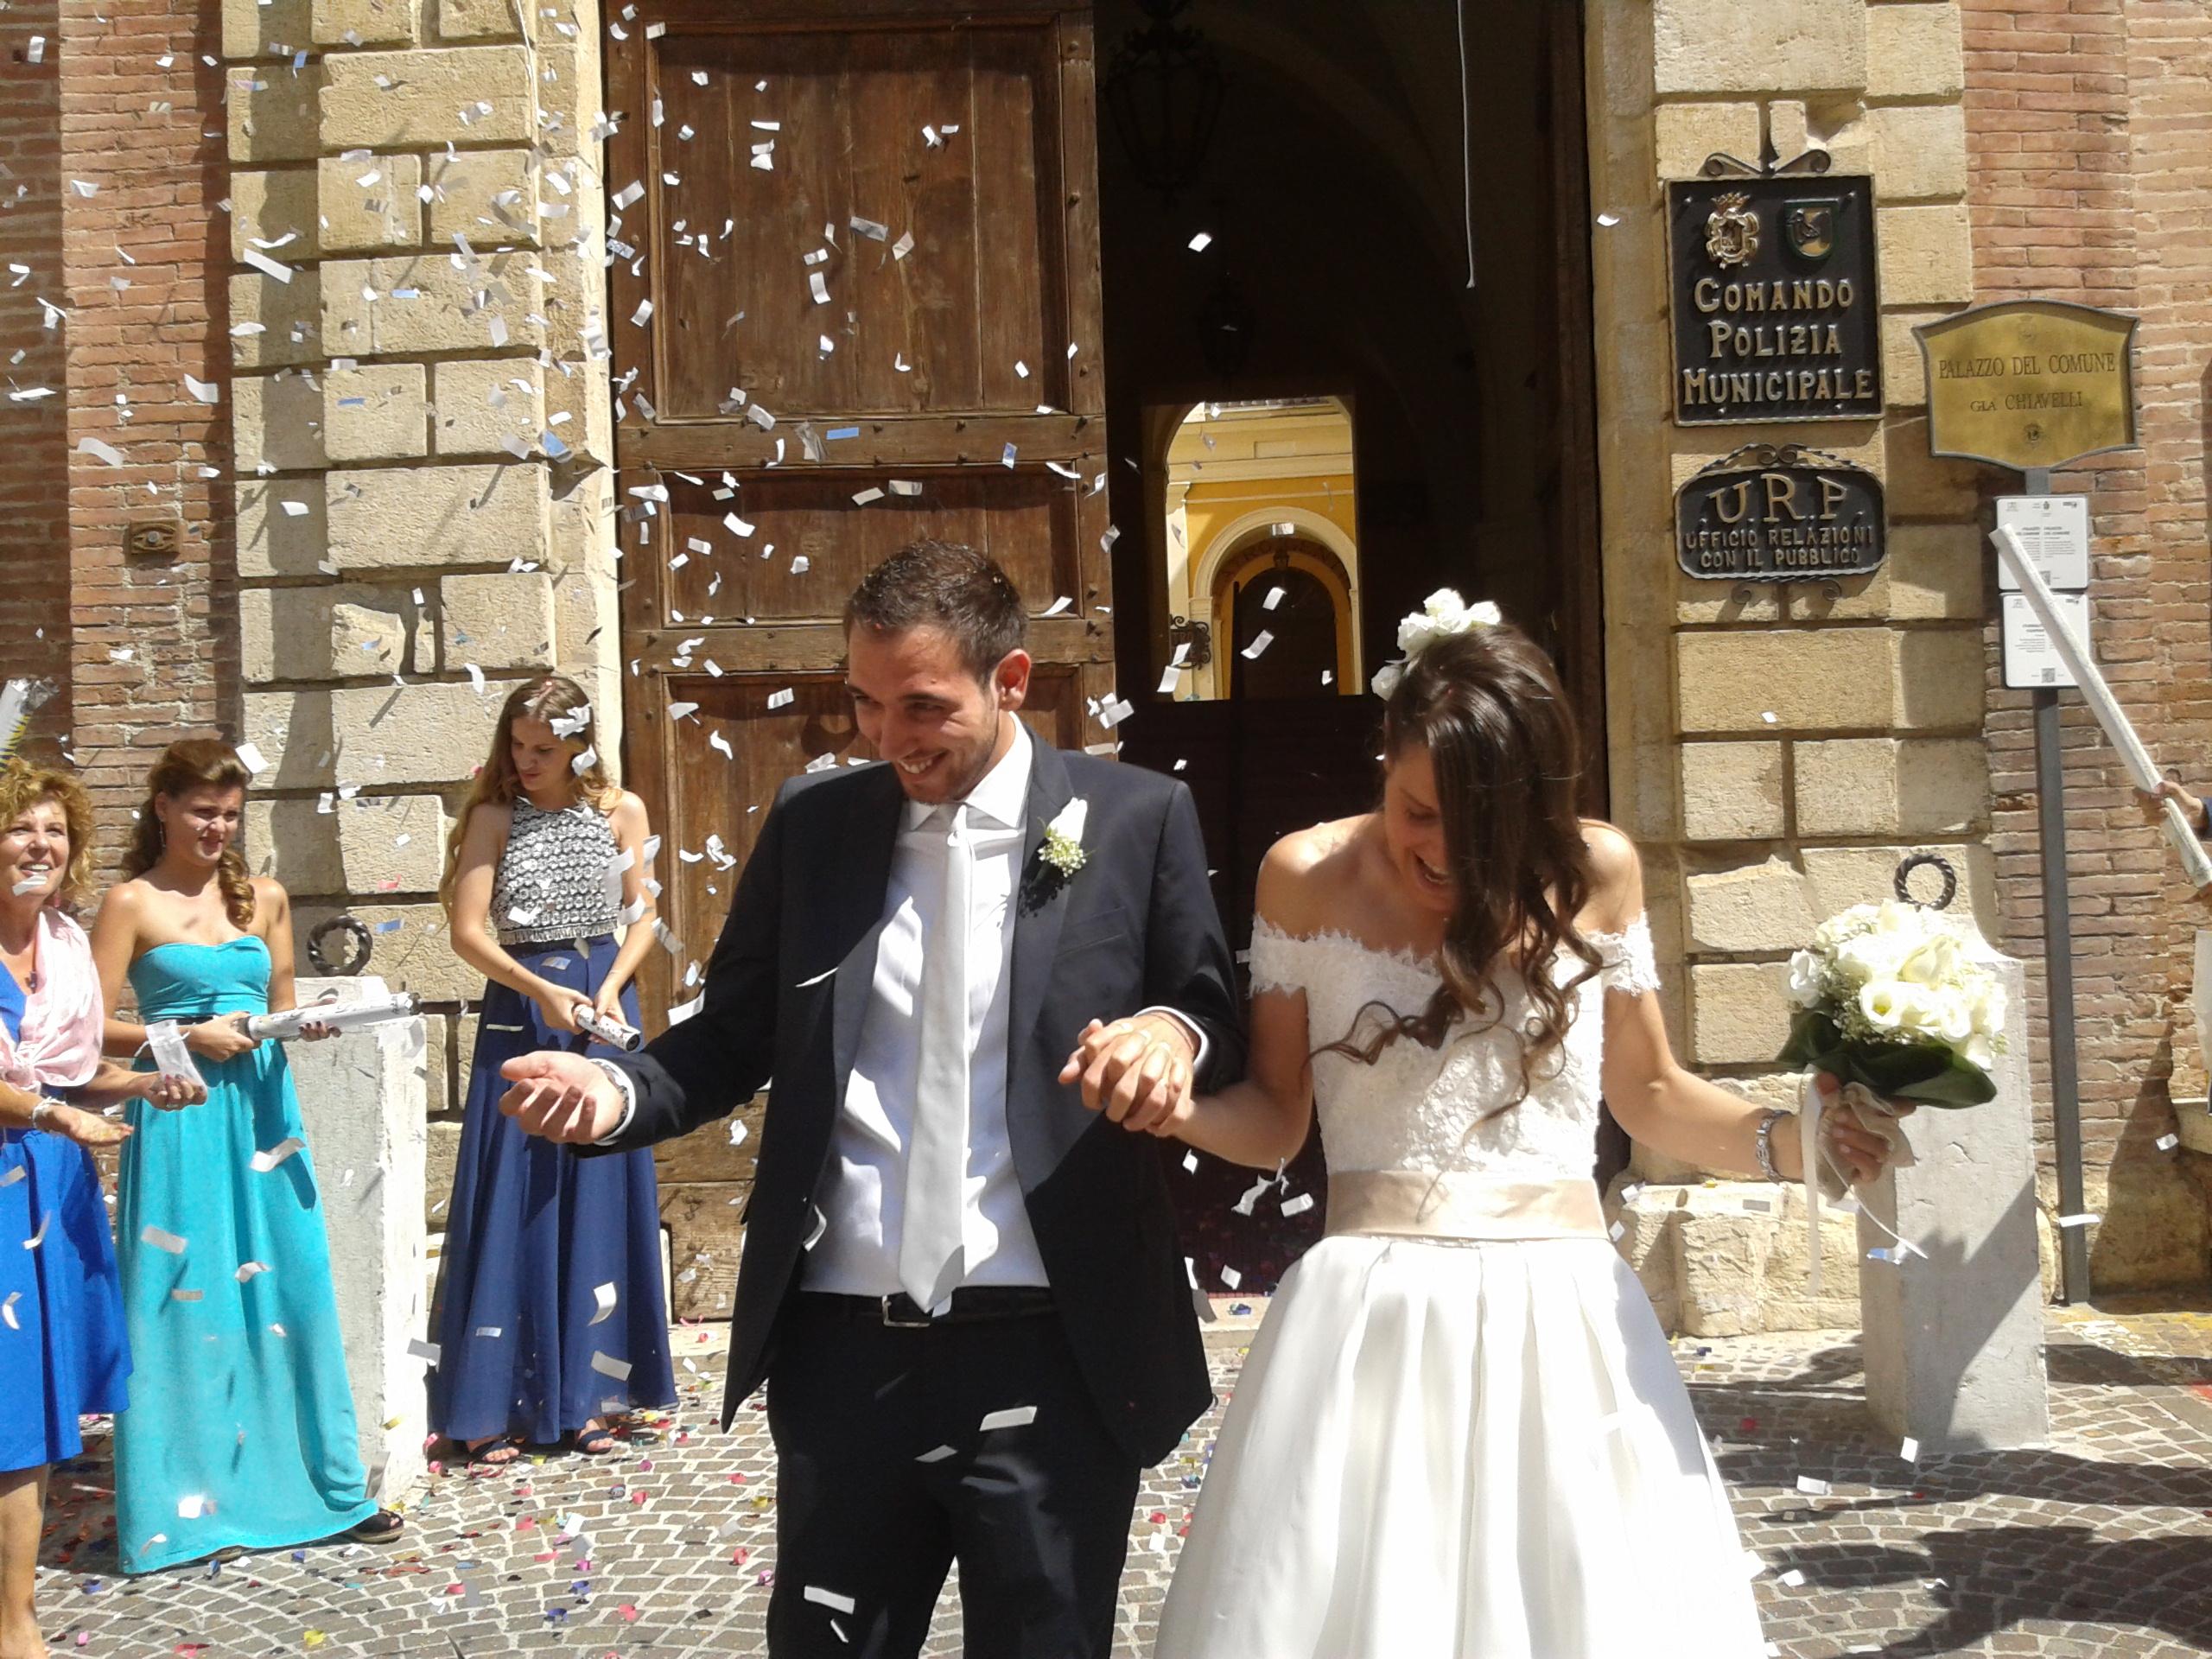 Elisa e Matteo: Narconon Astore testimonianze